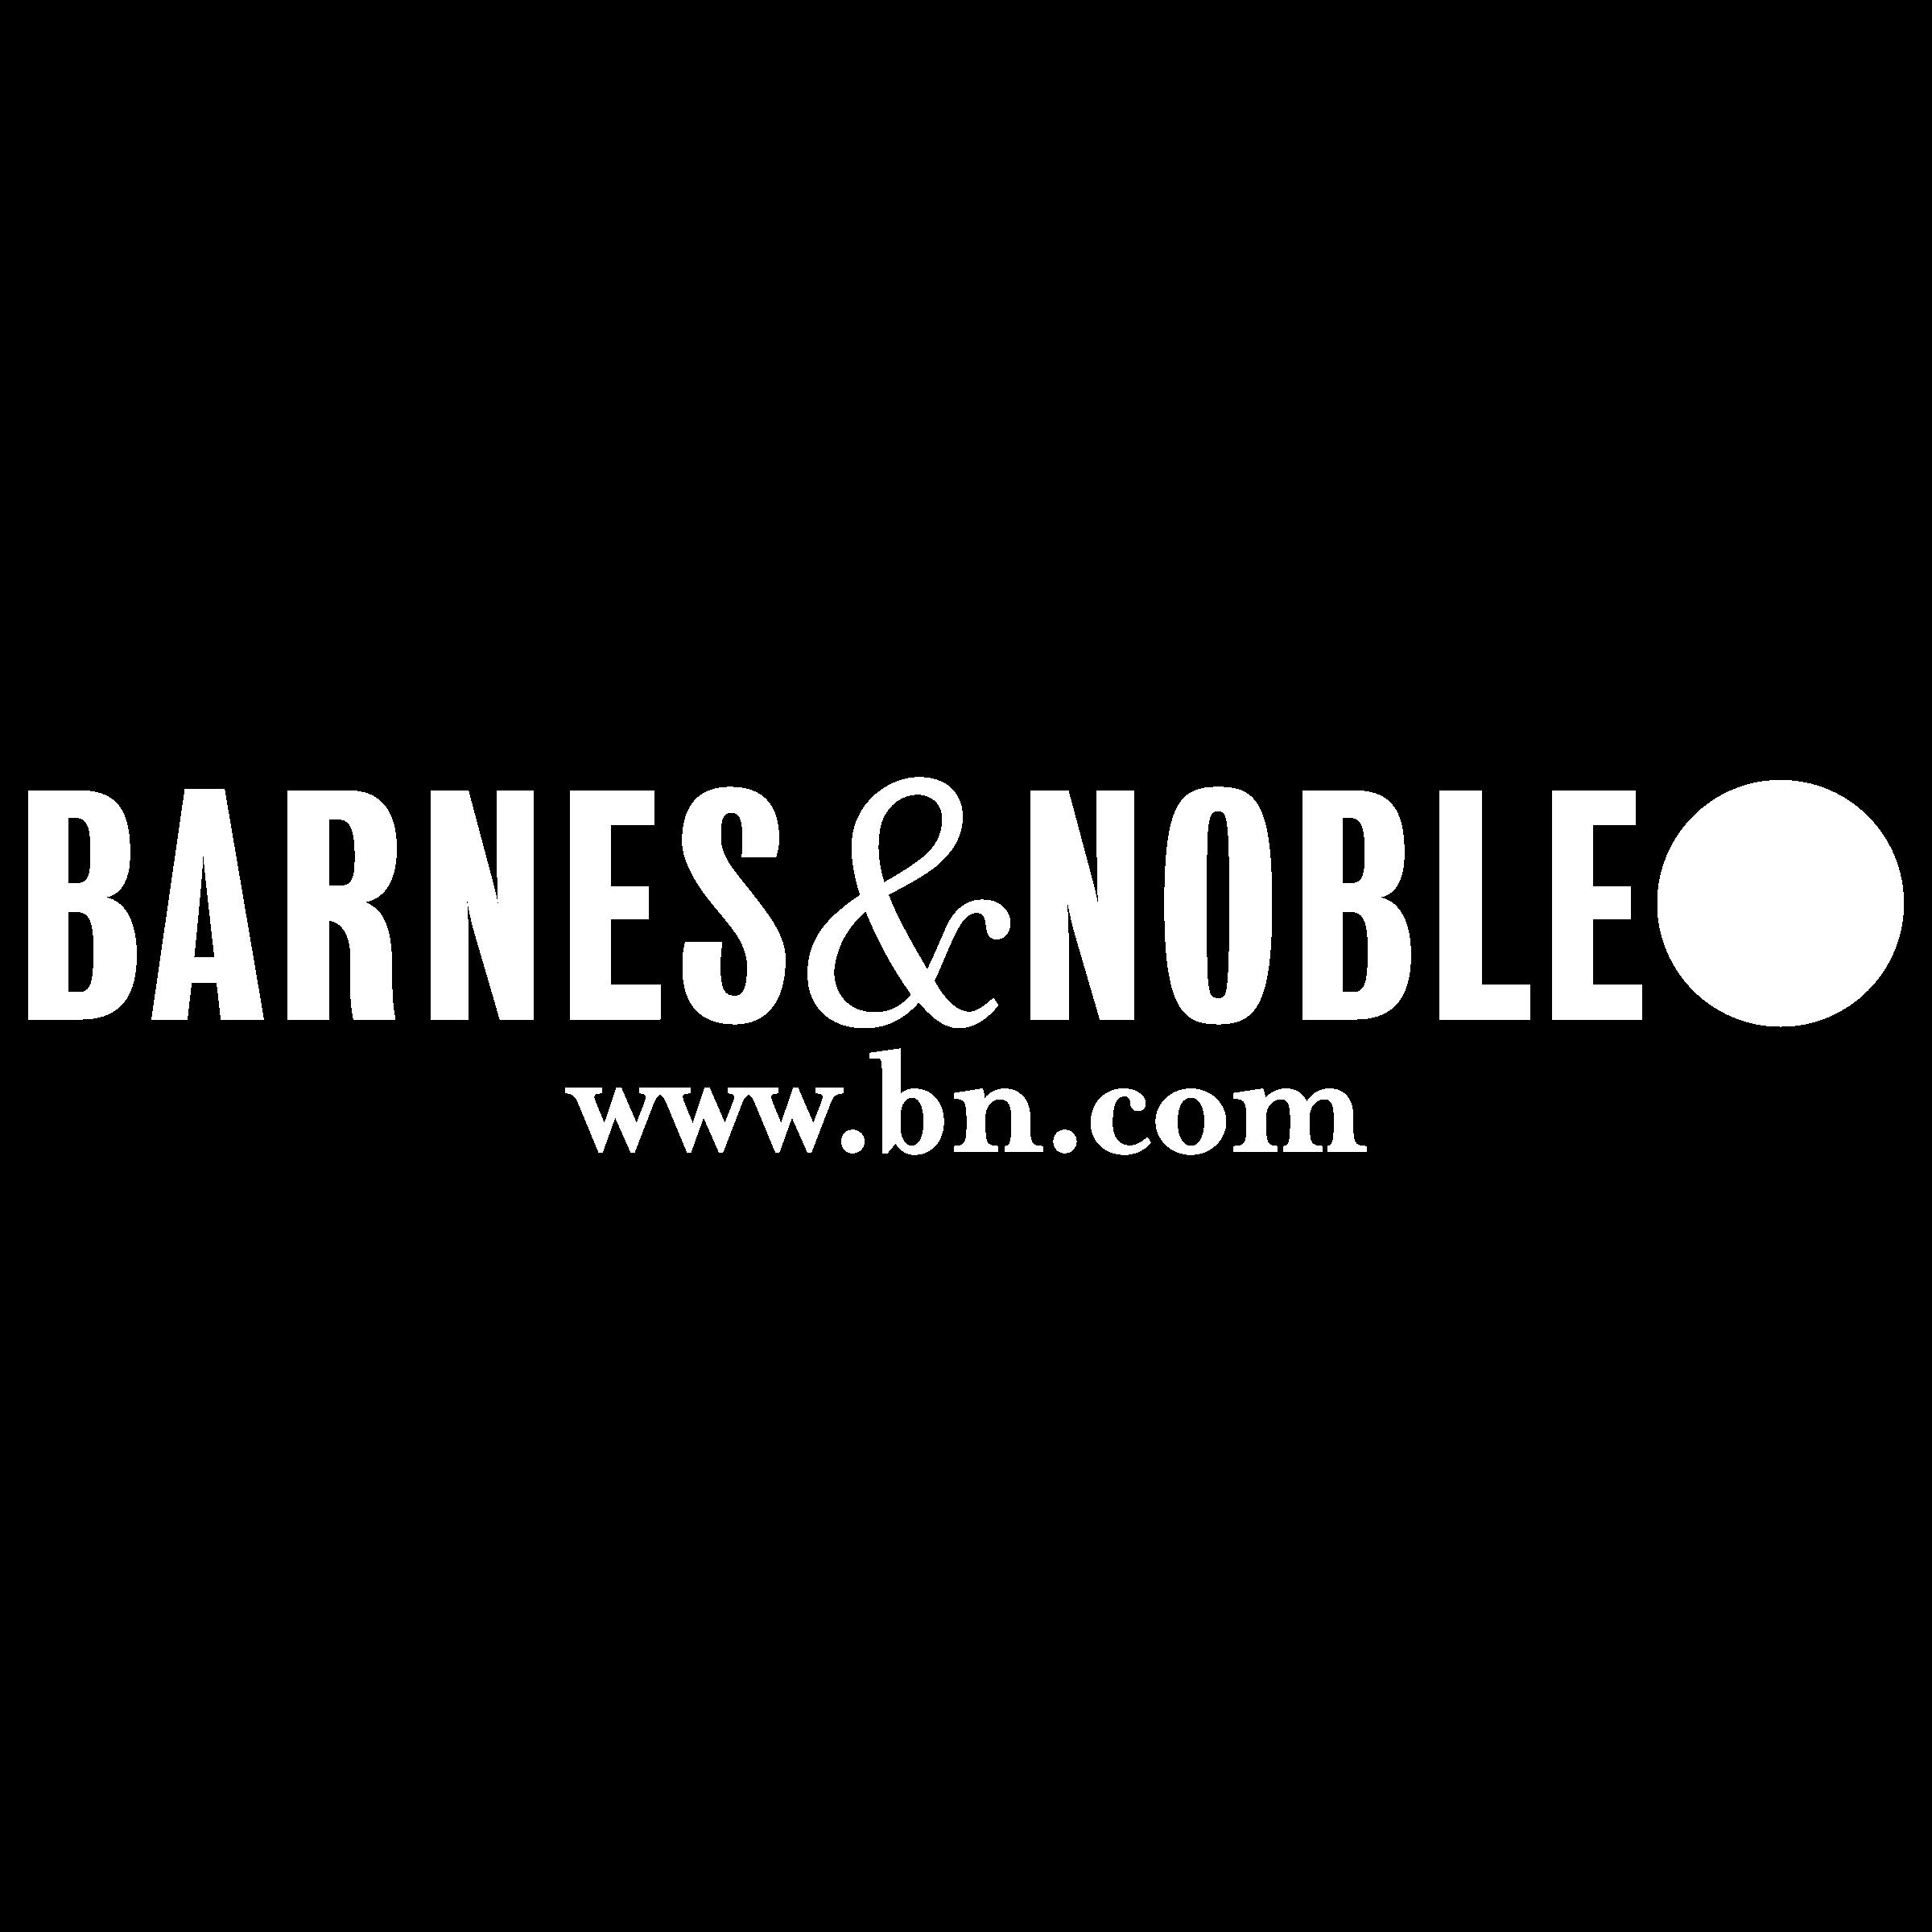 Barnes And Noble Logo Transparent.